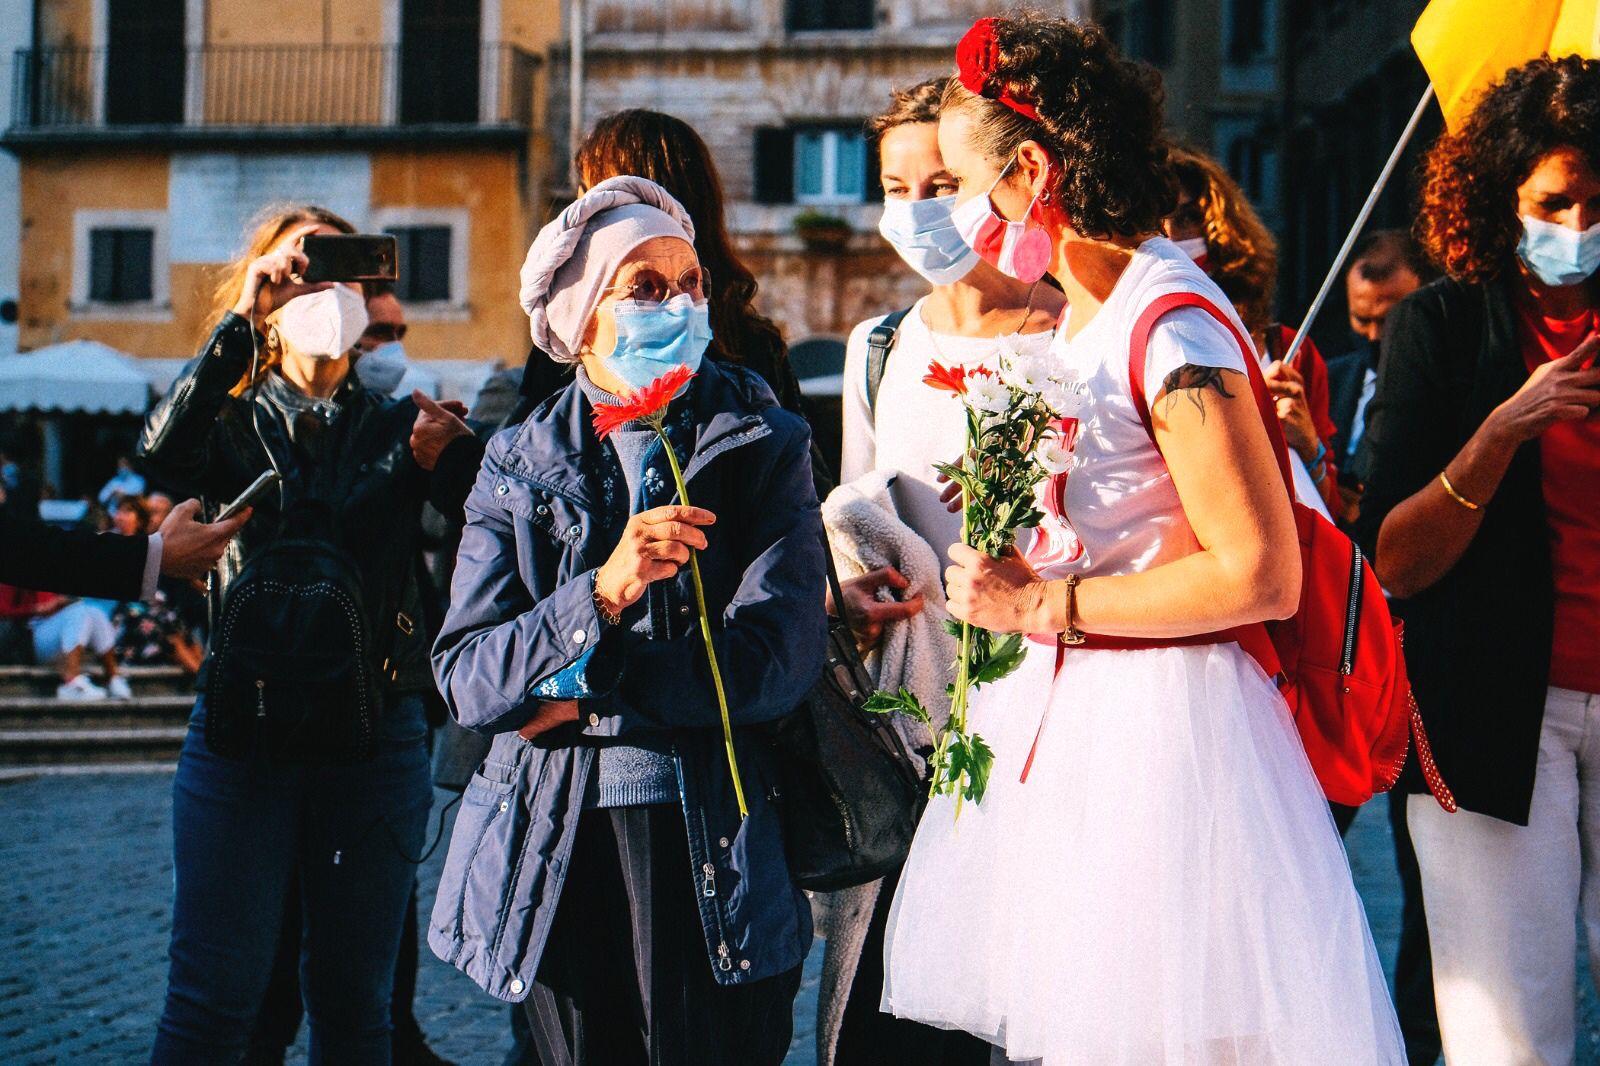 Ekaterina Zyuzyuk در کنار اما Bonino هنگام تظاهرات در ایتالیا